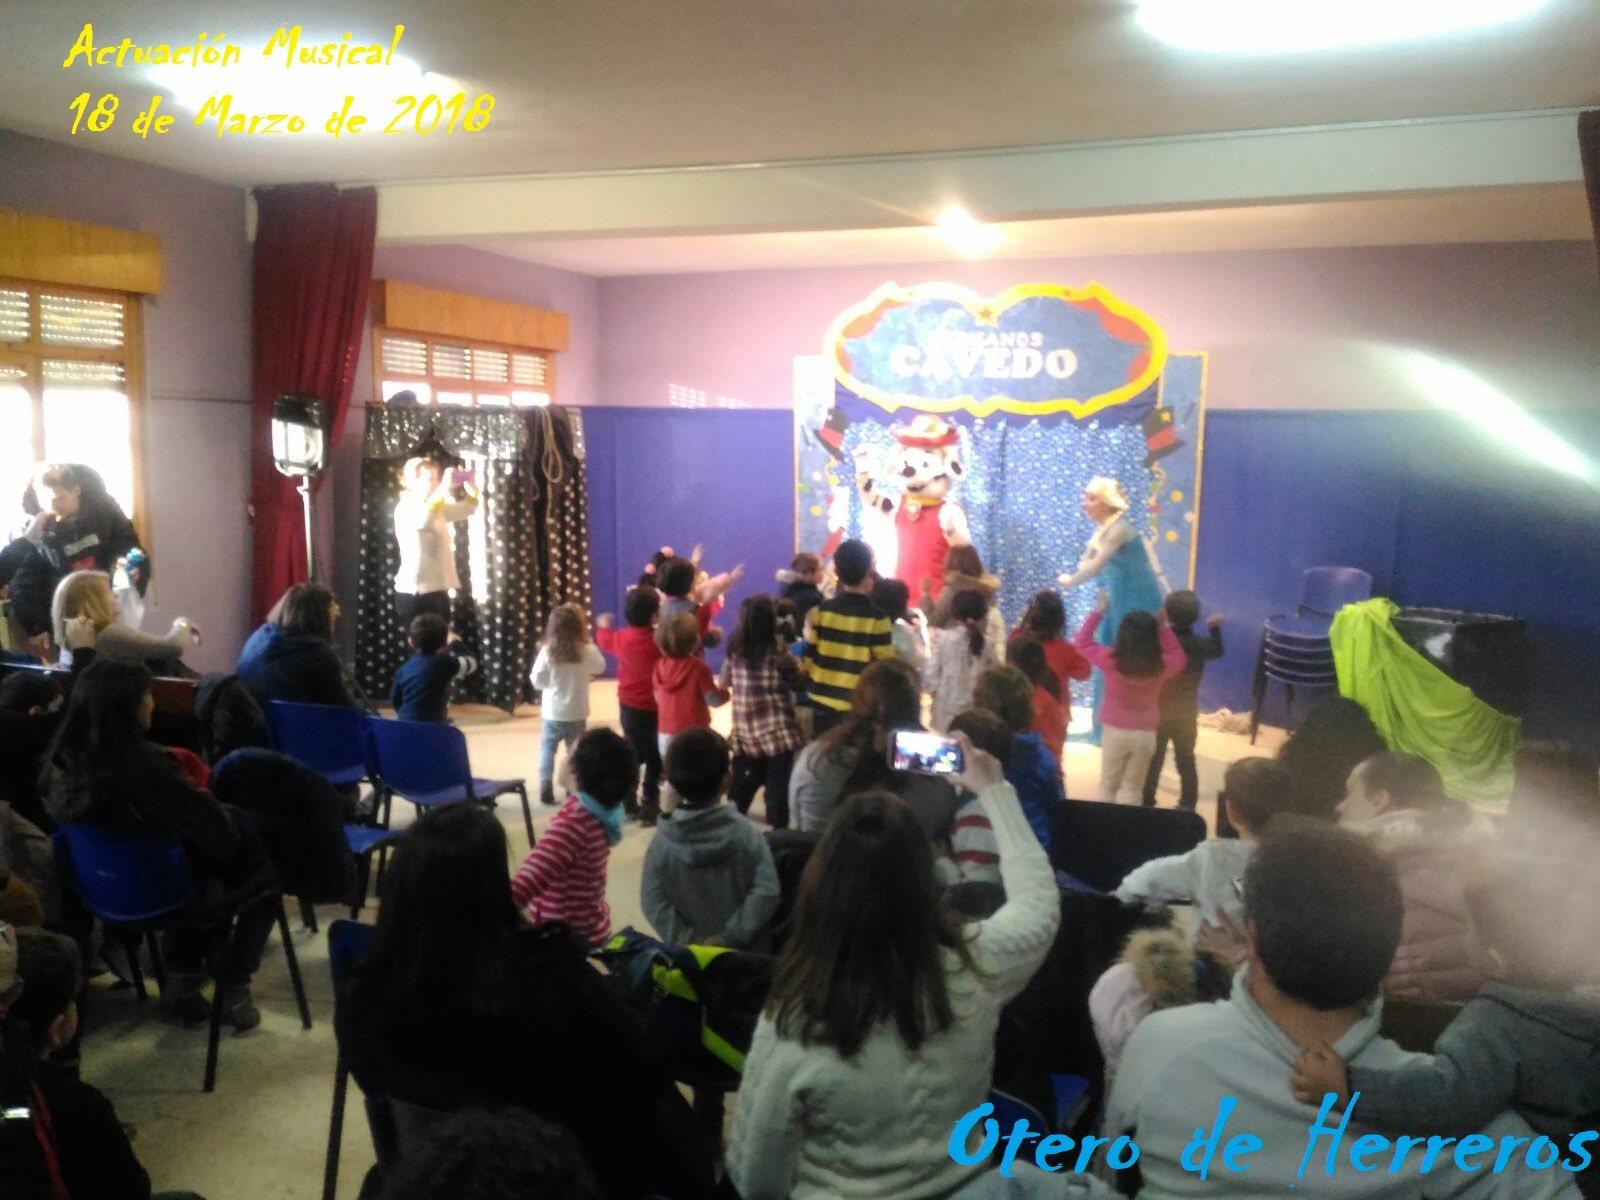 Hermanos Cavedo teatro Musical infantil (4)